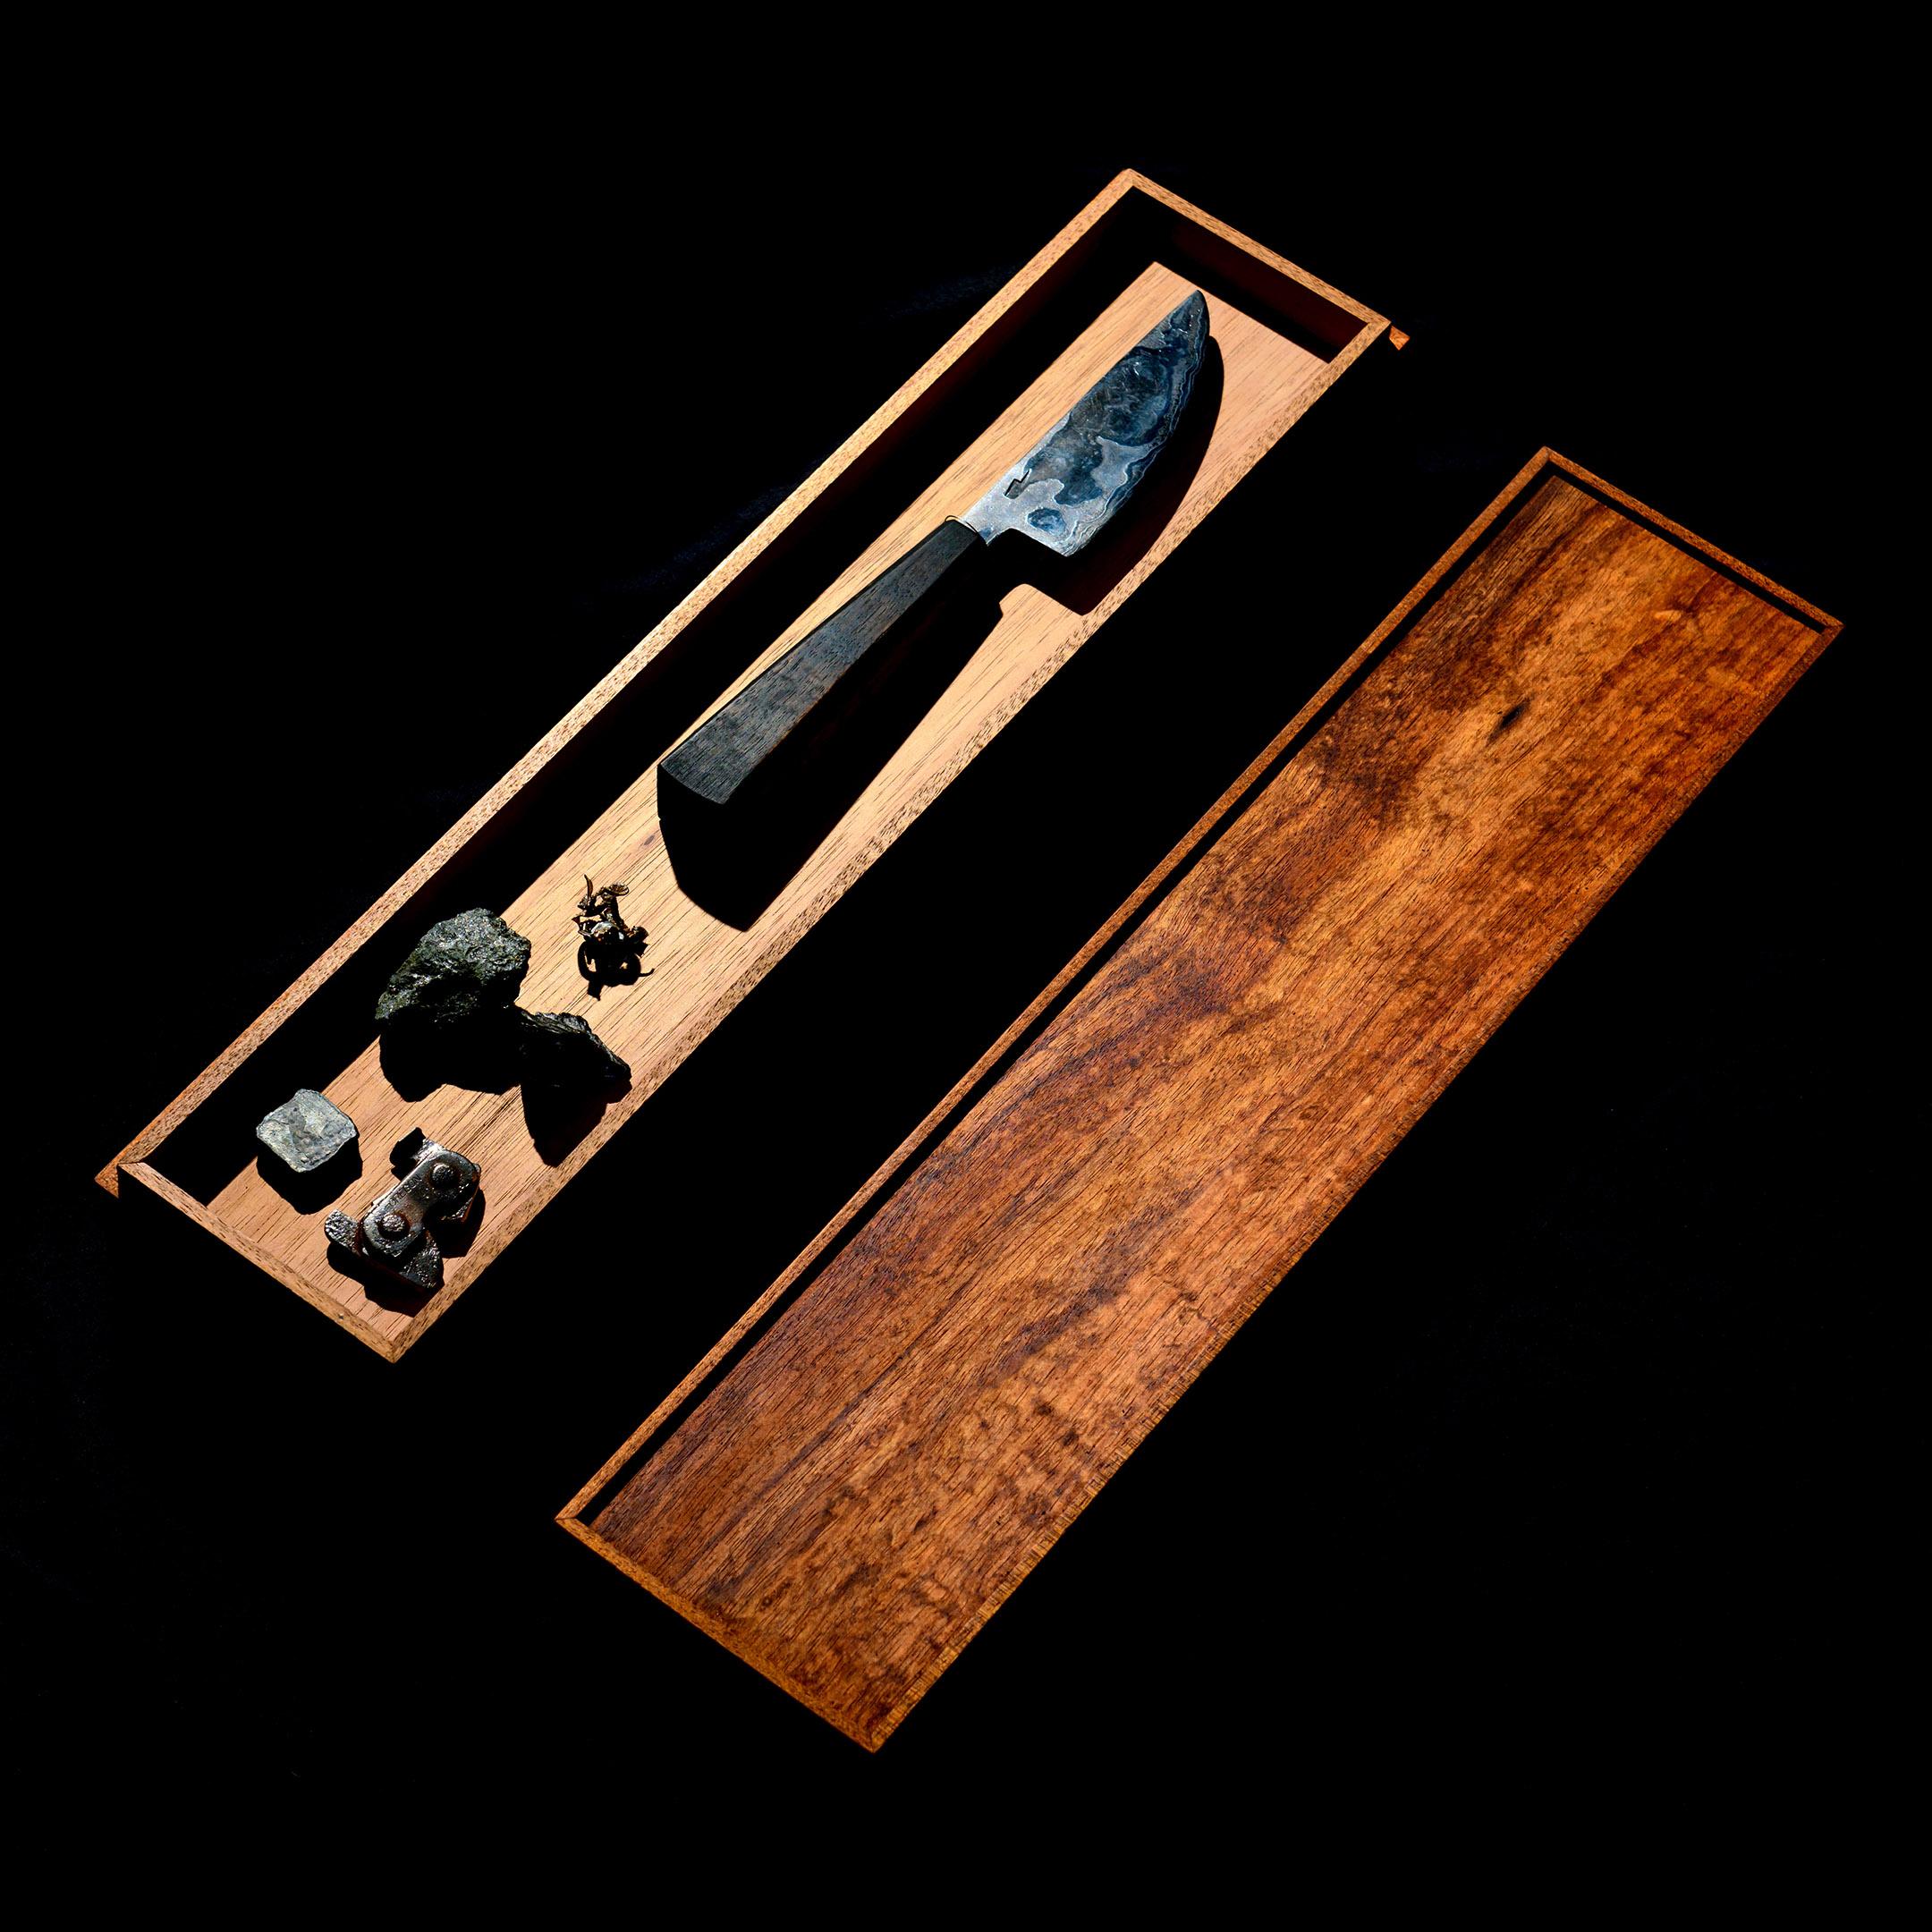 Pete-Mattila-Catalysis-Knife-Blade_095.jpg